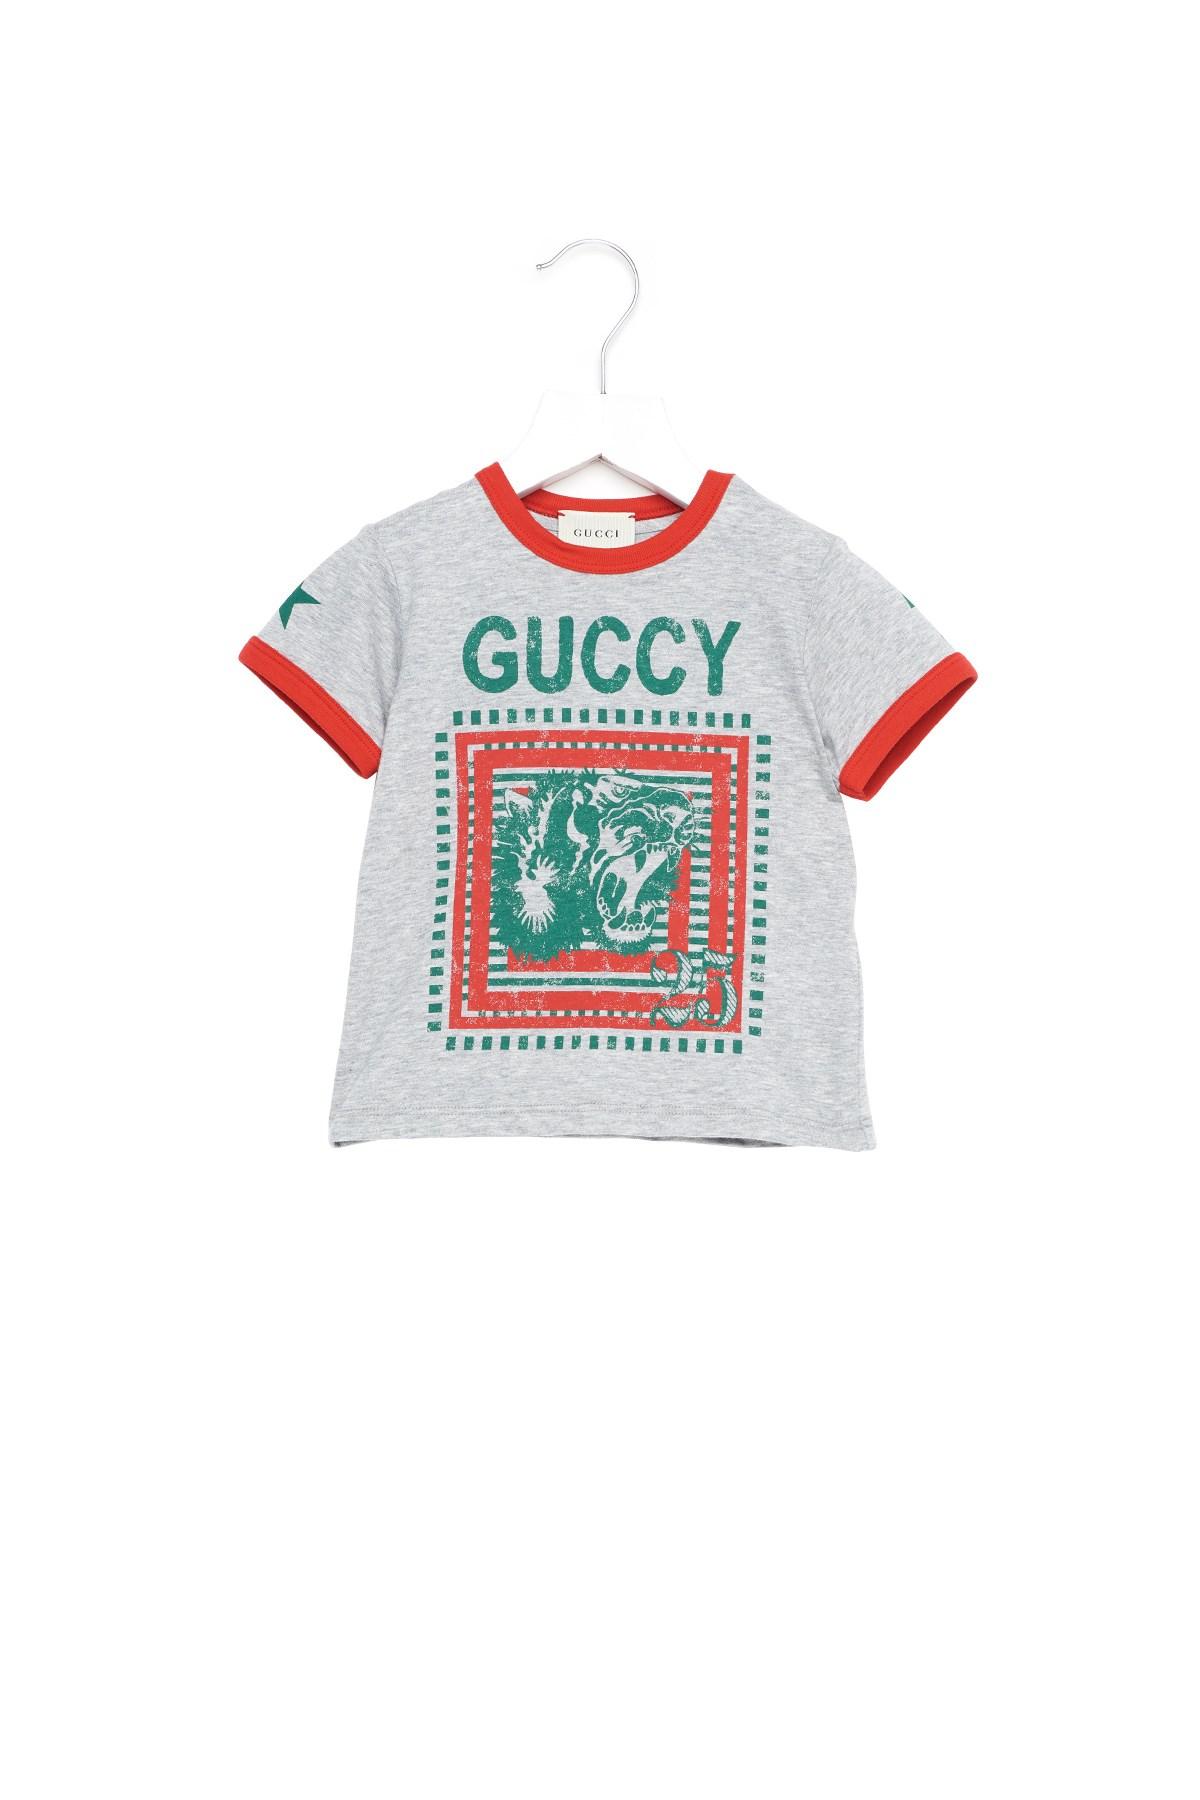 cf526fdef2c gucci  tiger print  t-shirt available on julian-fashion.com - 59243